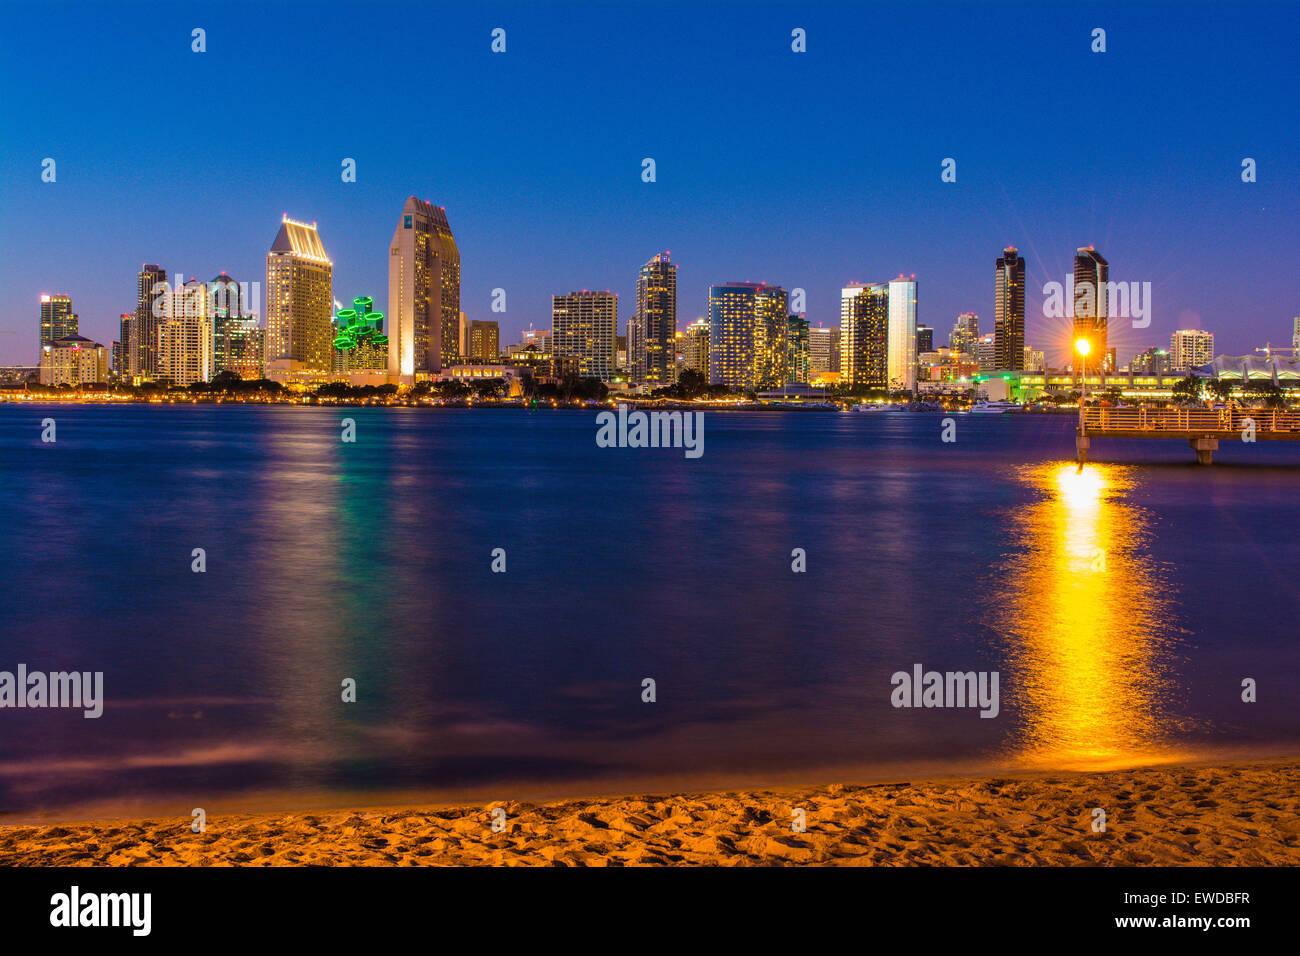 Downtown San Diego skyline from Coronado Island, California, USA - Stock Image